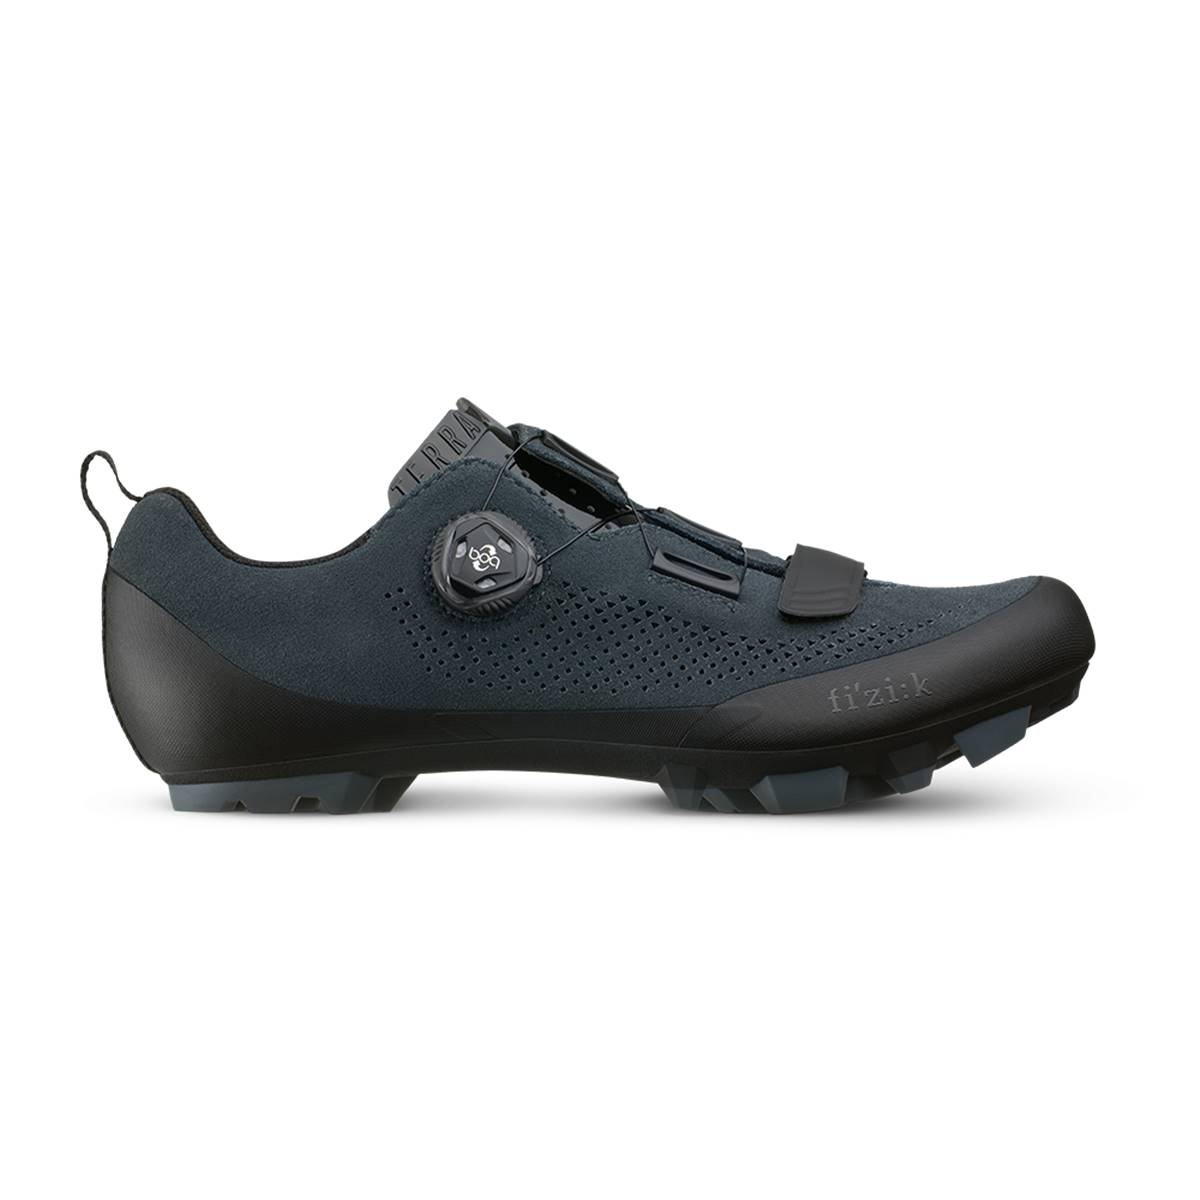 fb0903e333fb FIZIK Chaussures VTT FIZIK Terra X5 Suede Anthracite (2019) | Intercycle